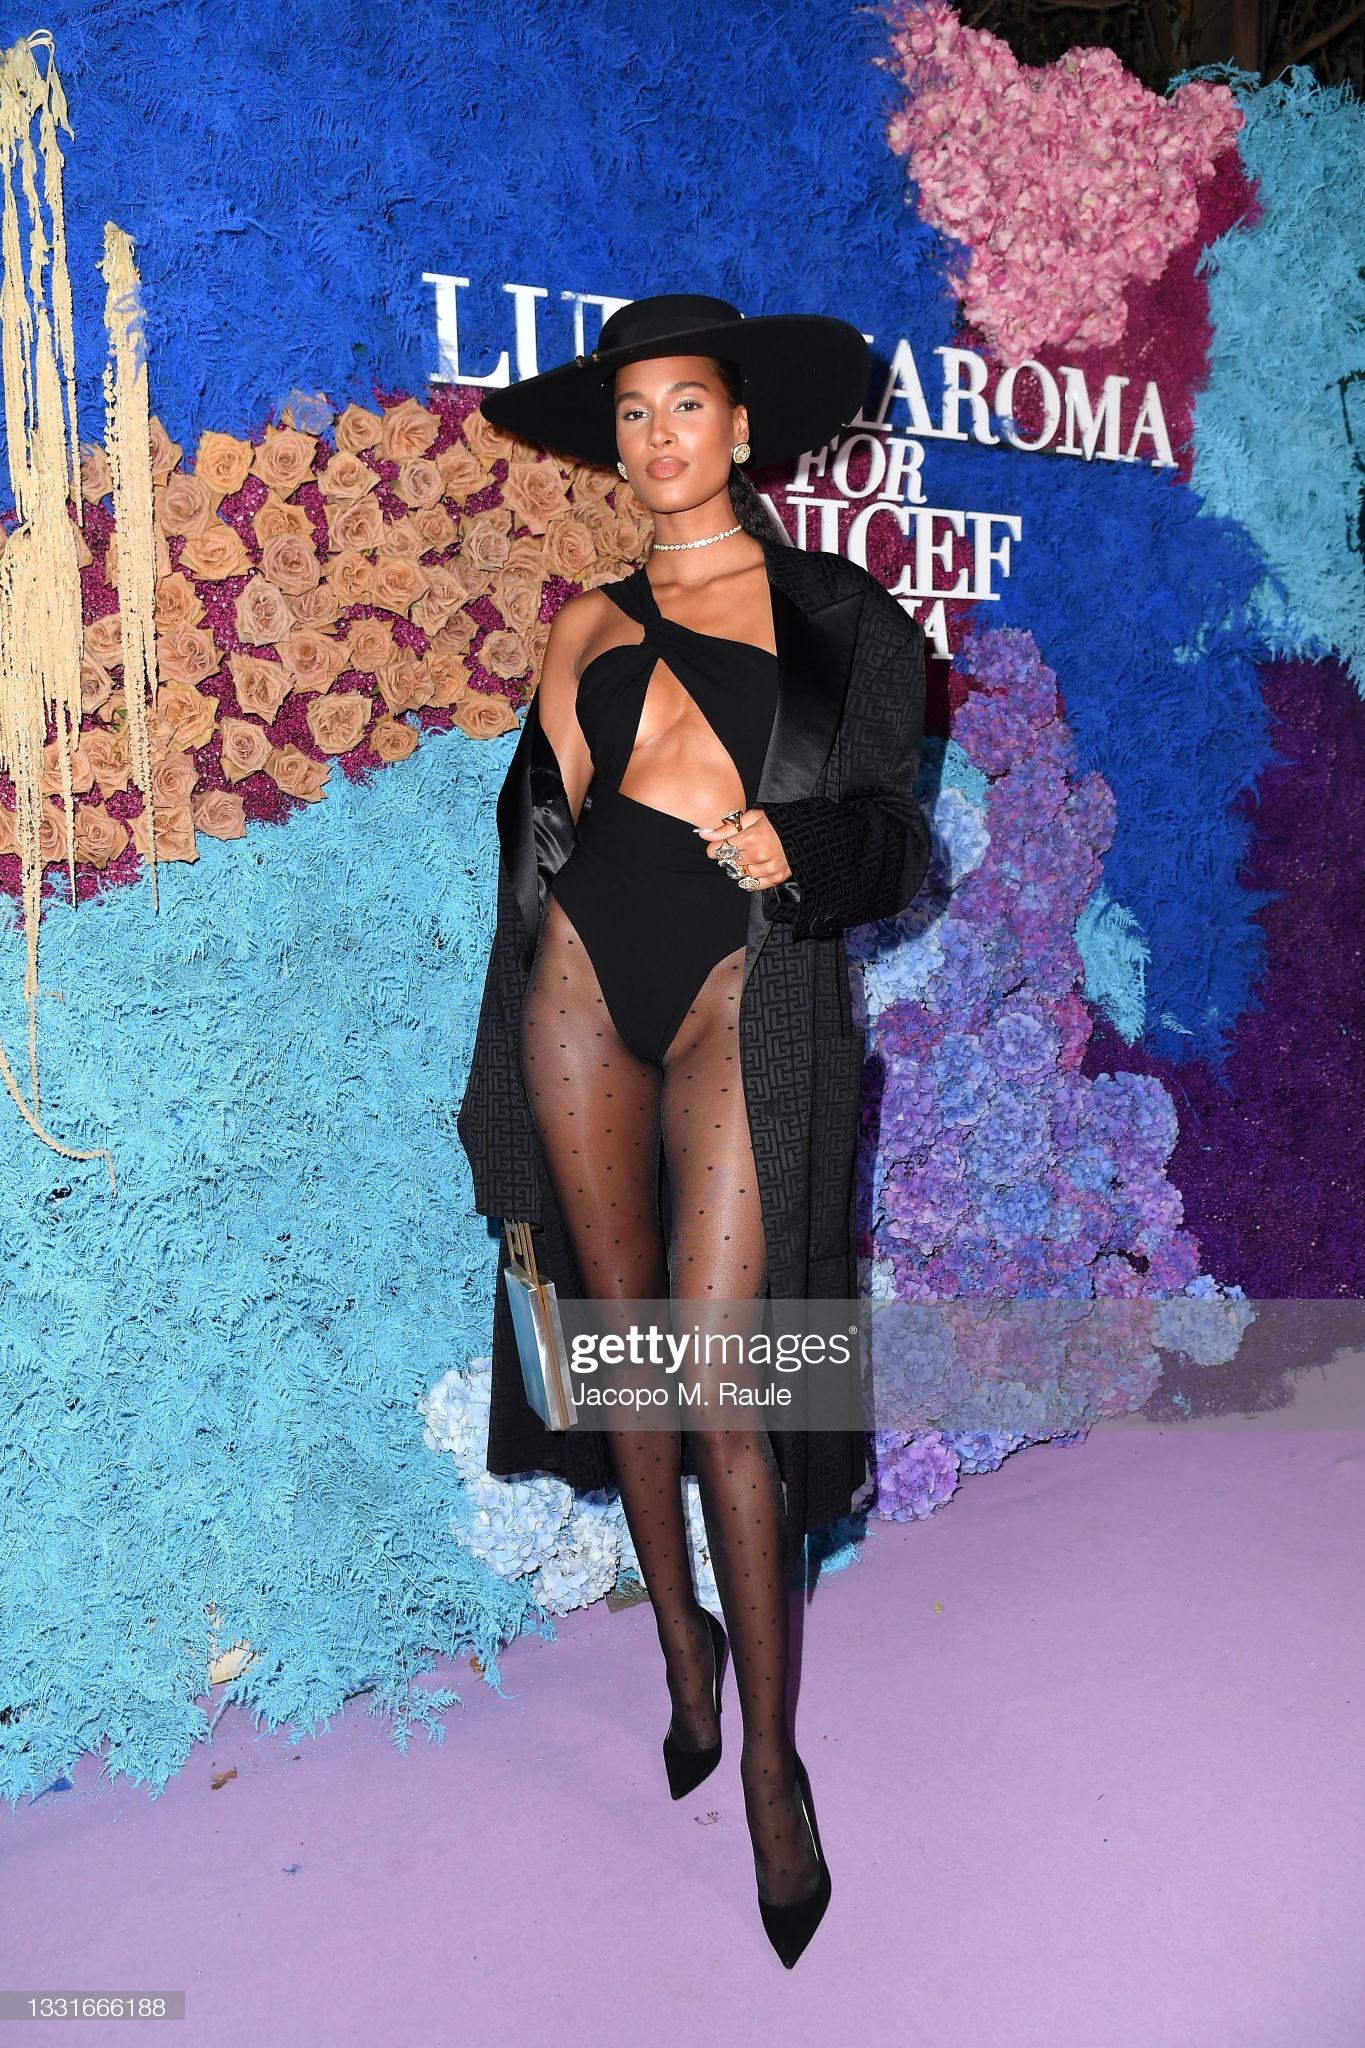 cindy-bruna-wore-monot-bodysuit-luisaviaroma-for-unicef-gala-in-italy